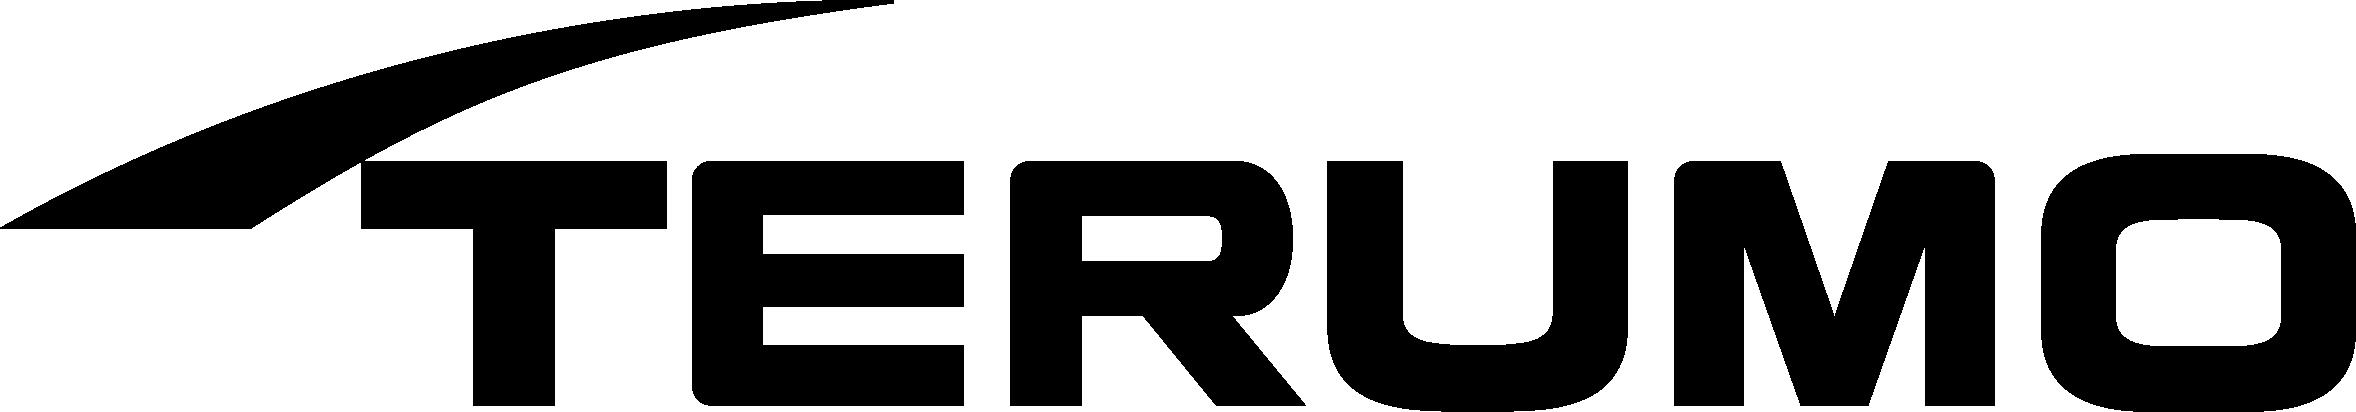 Logo klant van White Light: Terumo